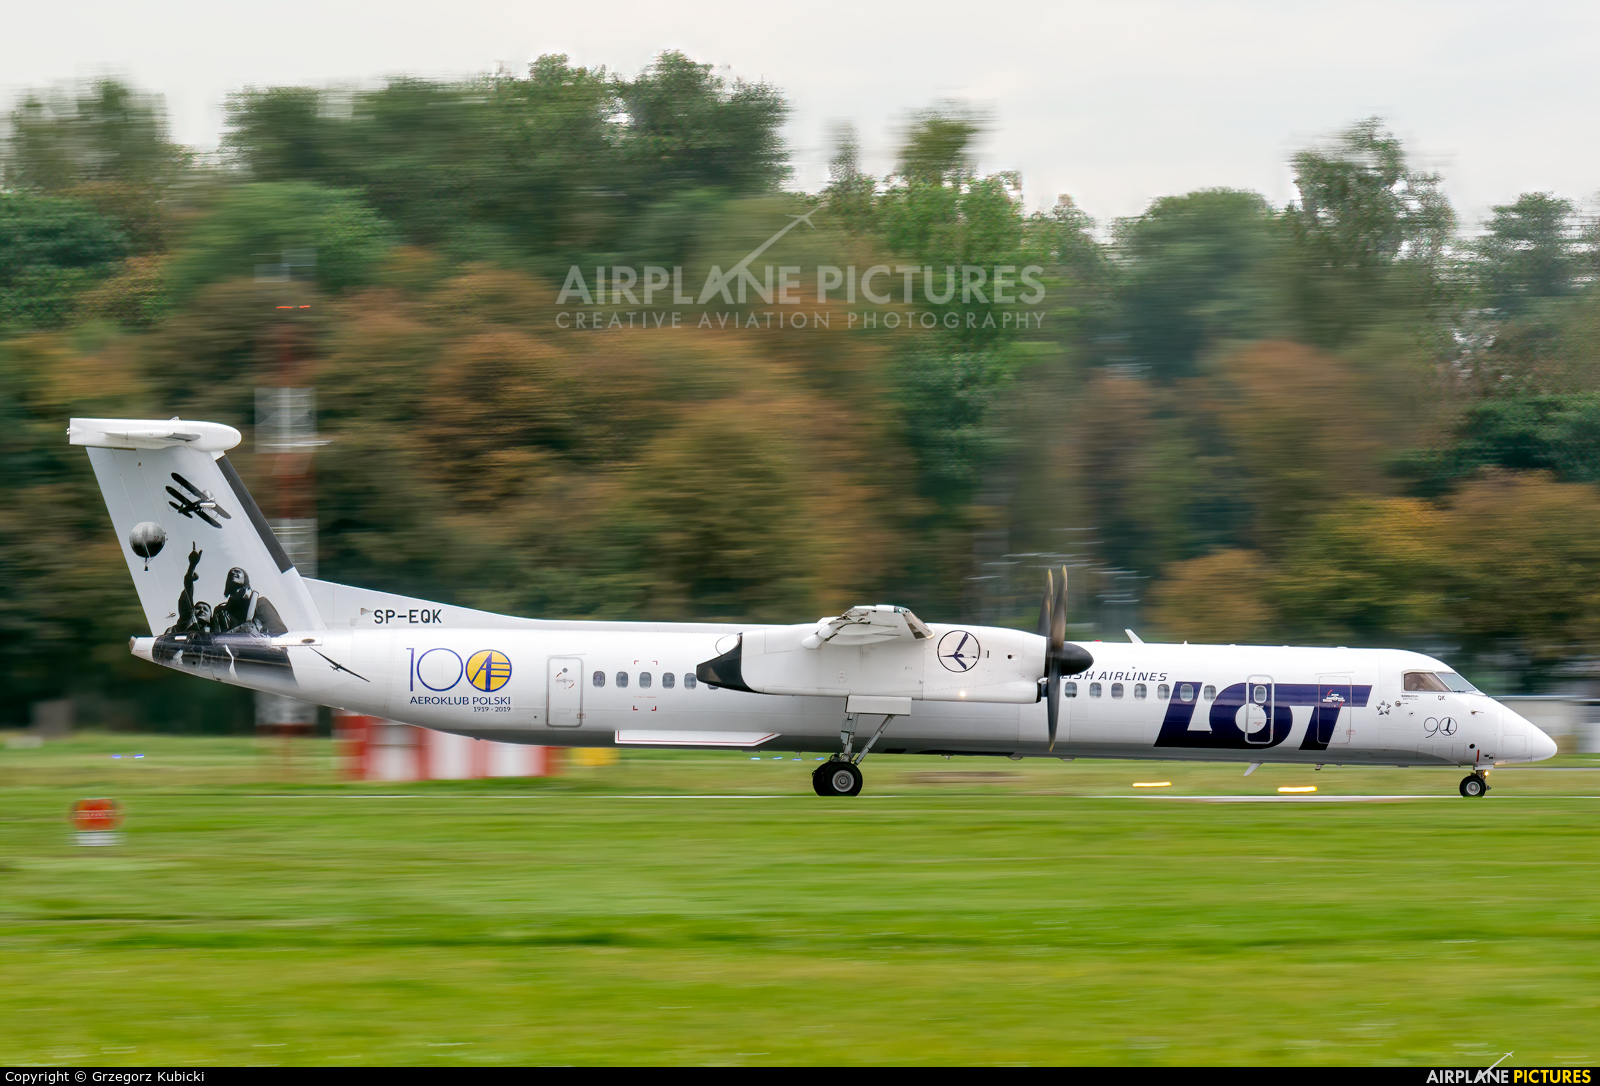 LOT - Polish Airlines SP-EQK aircraft at Kraków - John Paul II Intl